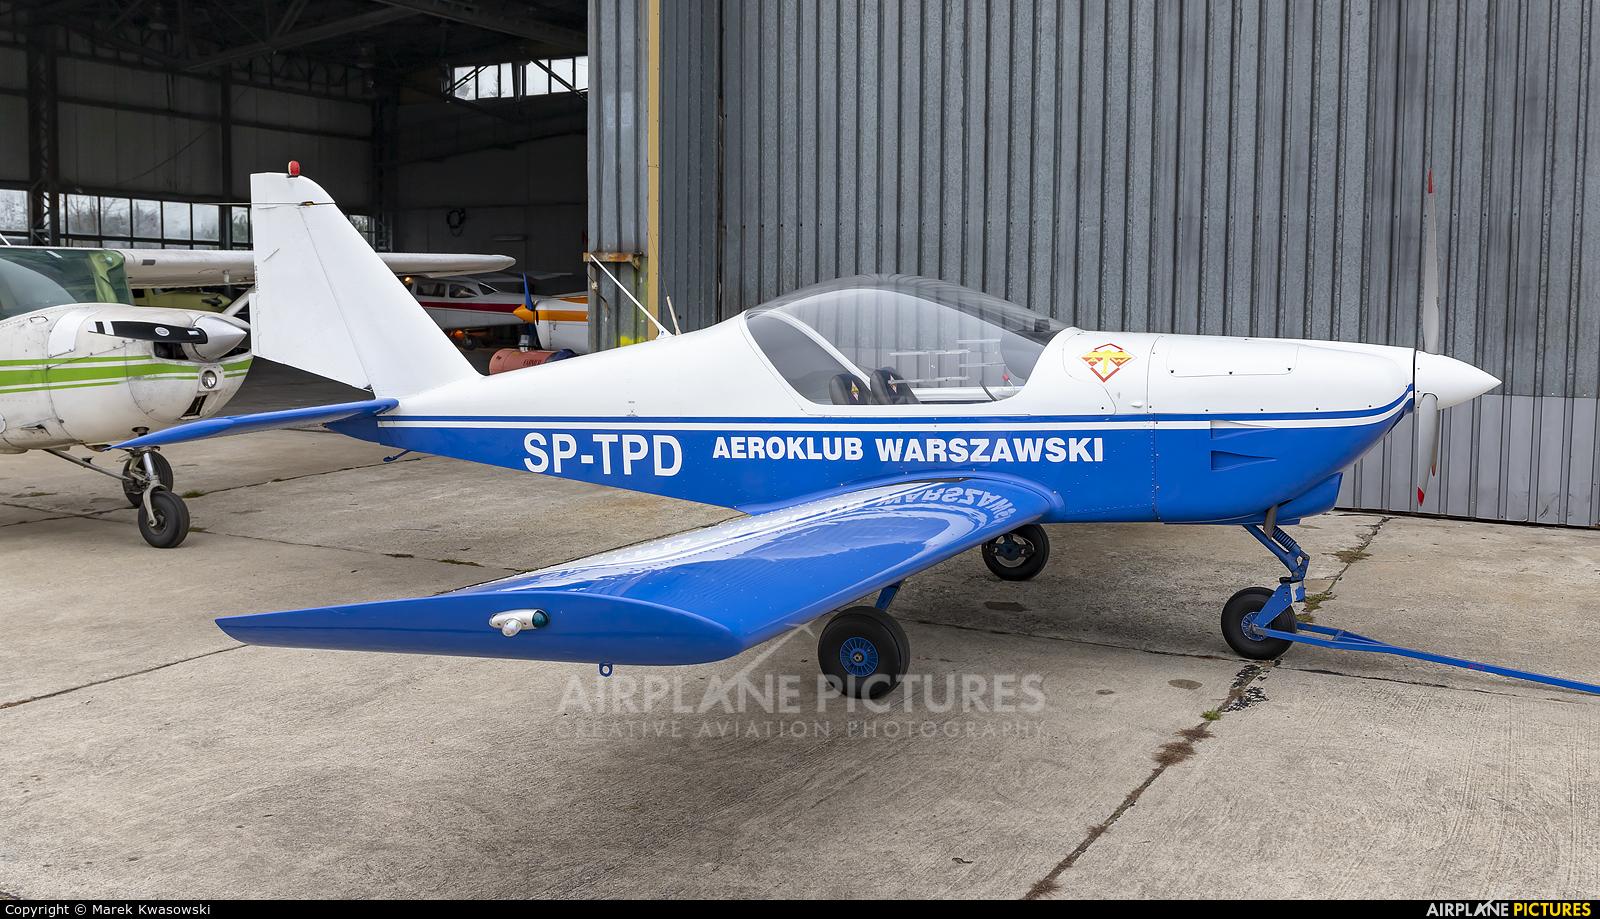 Aeroklub Warszawski SP-TPD aircraft at Warsaw - Babice